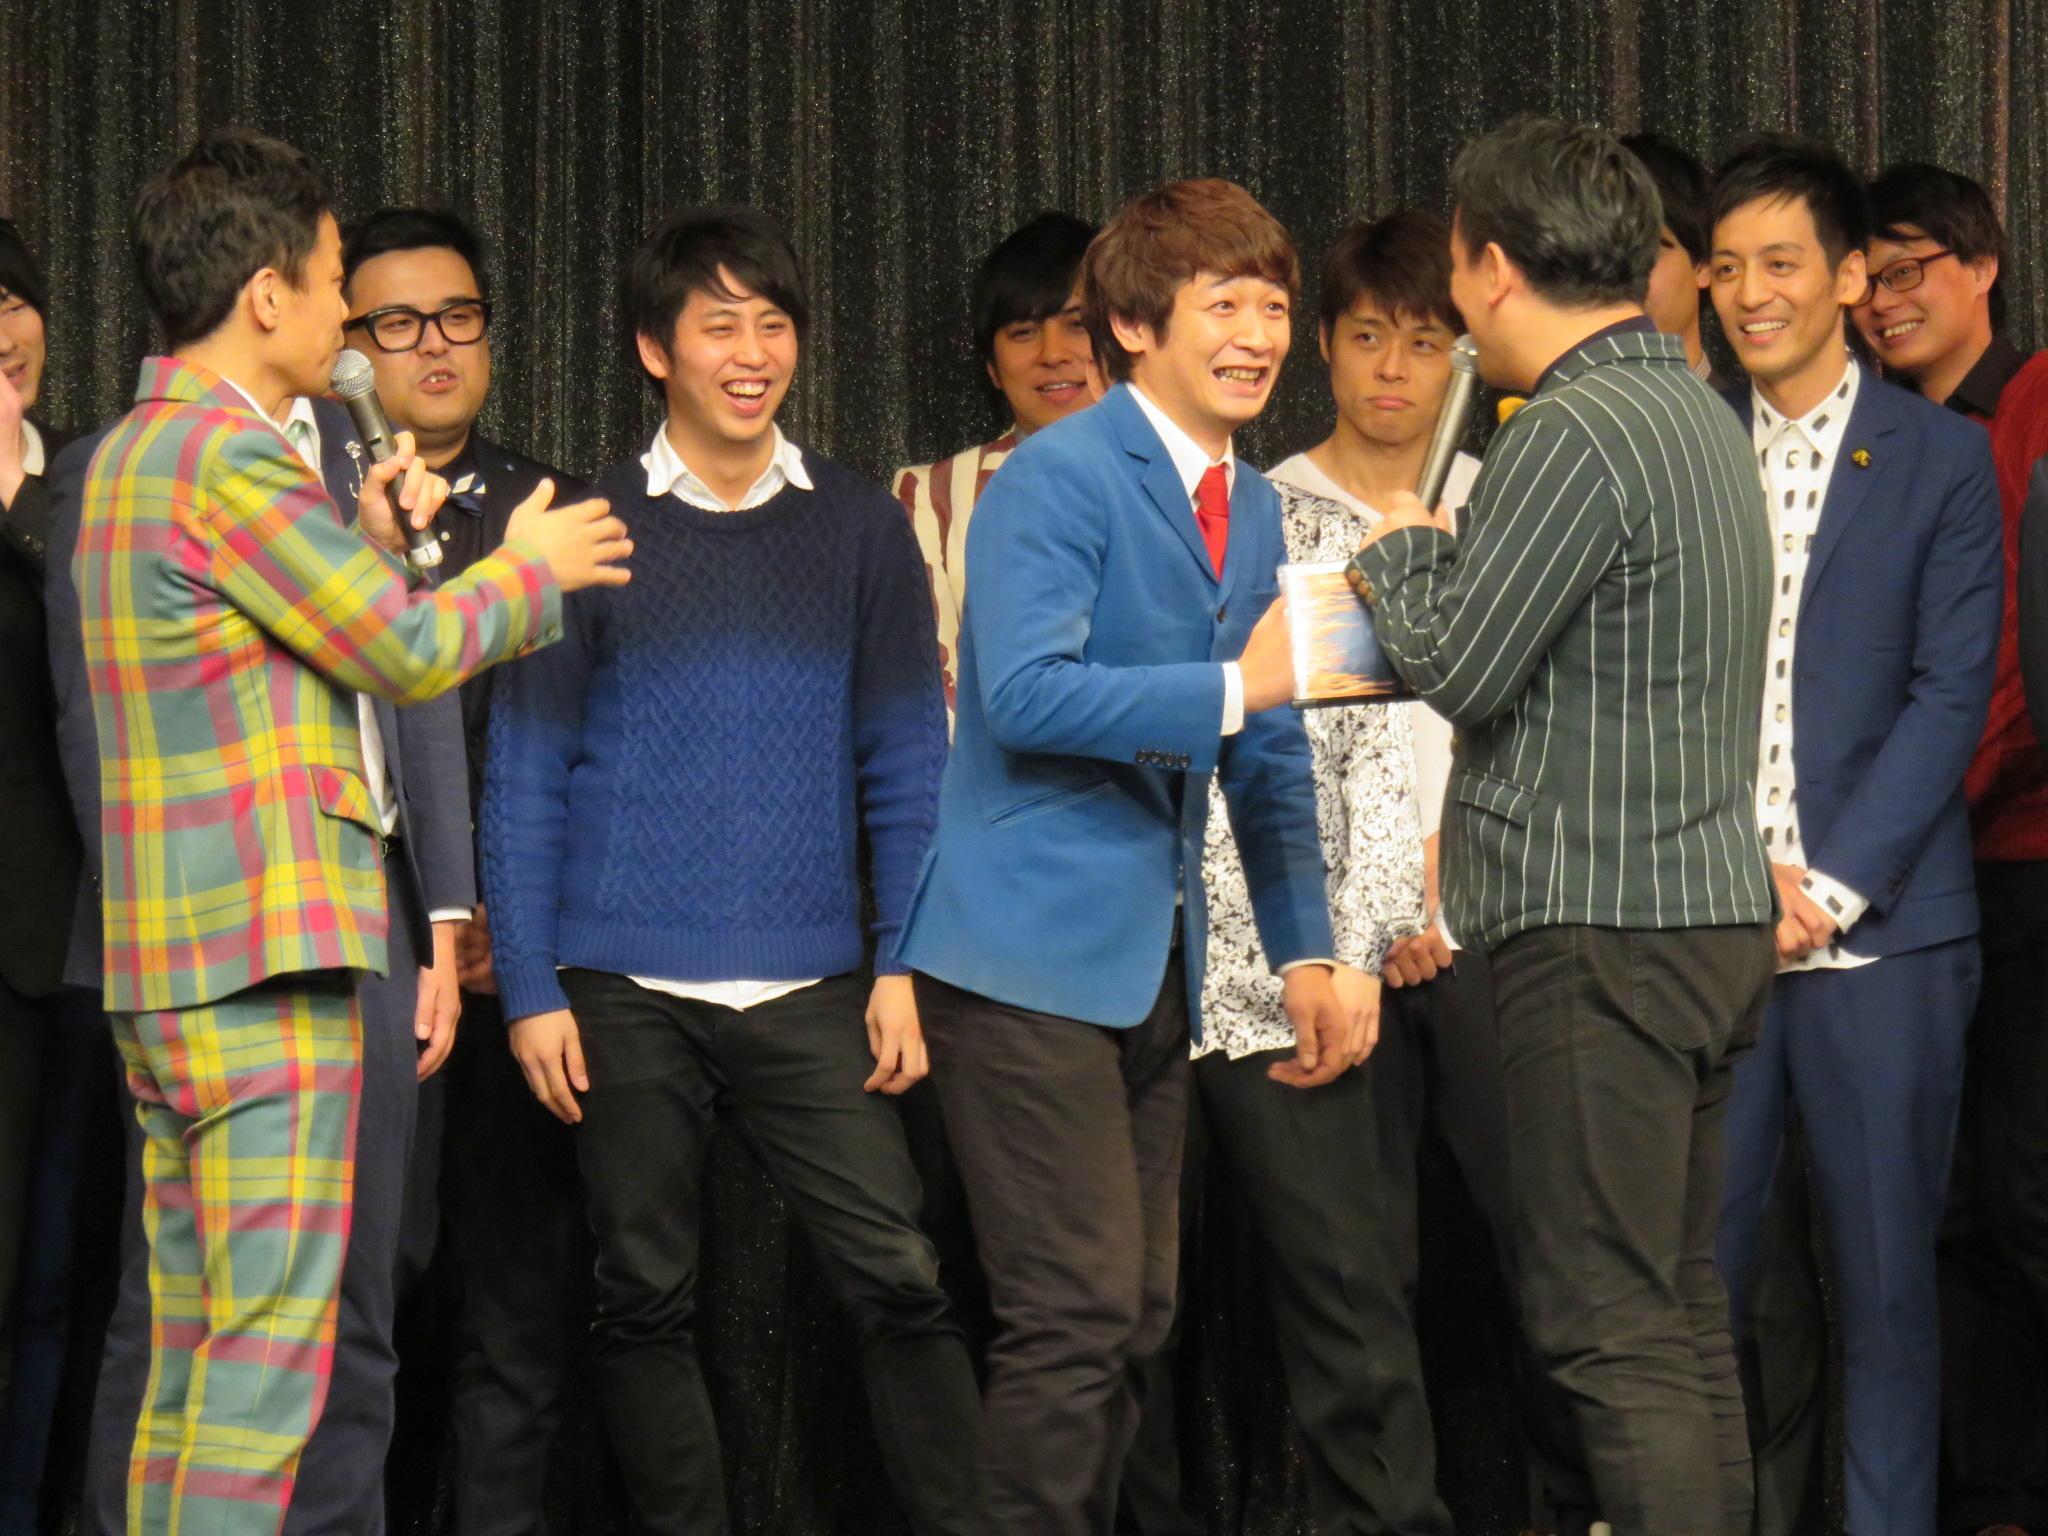 http://news.yoshimoto.co.jp/20151230170112-4a2e55d51ddc522f57a5e771b8266e3c68dcff1a.jpg